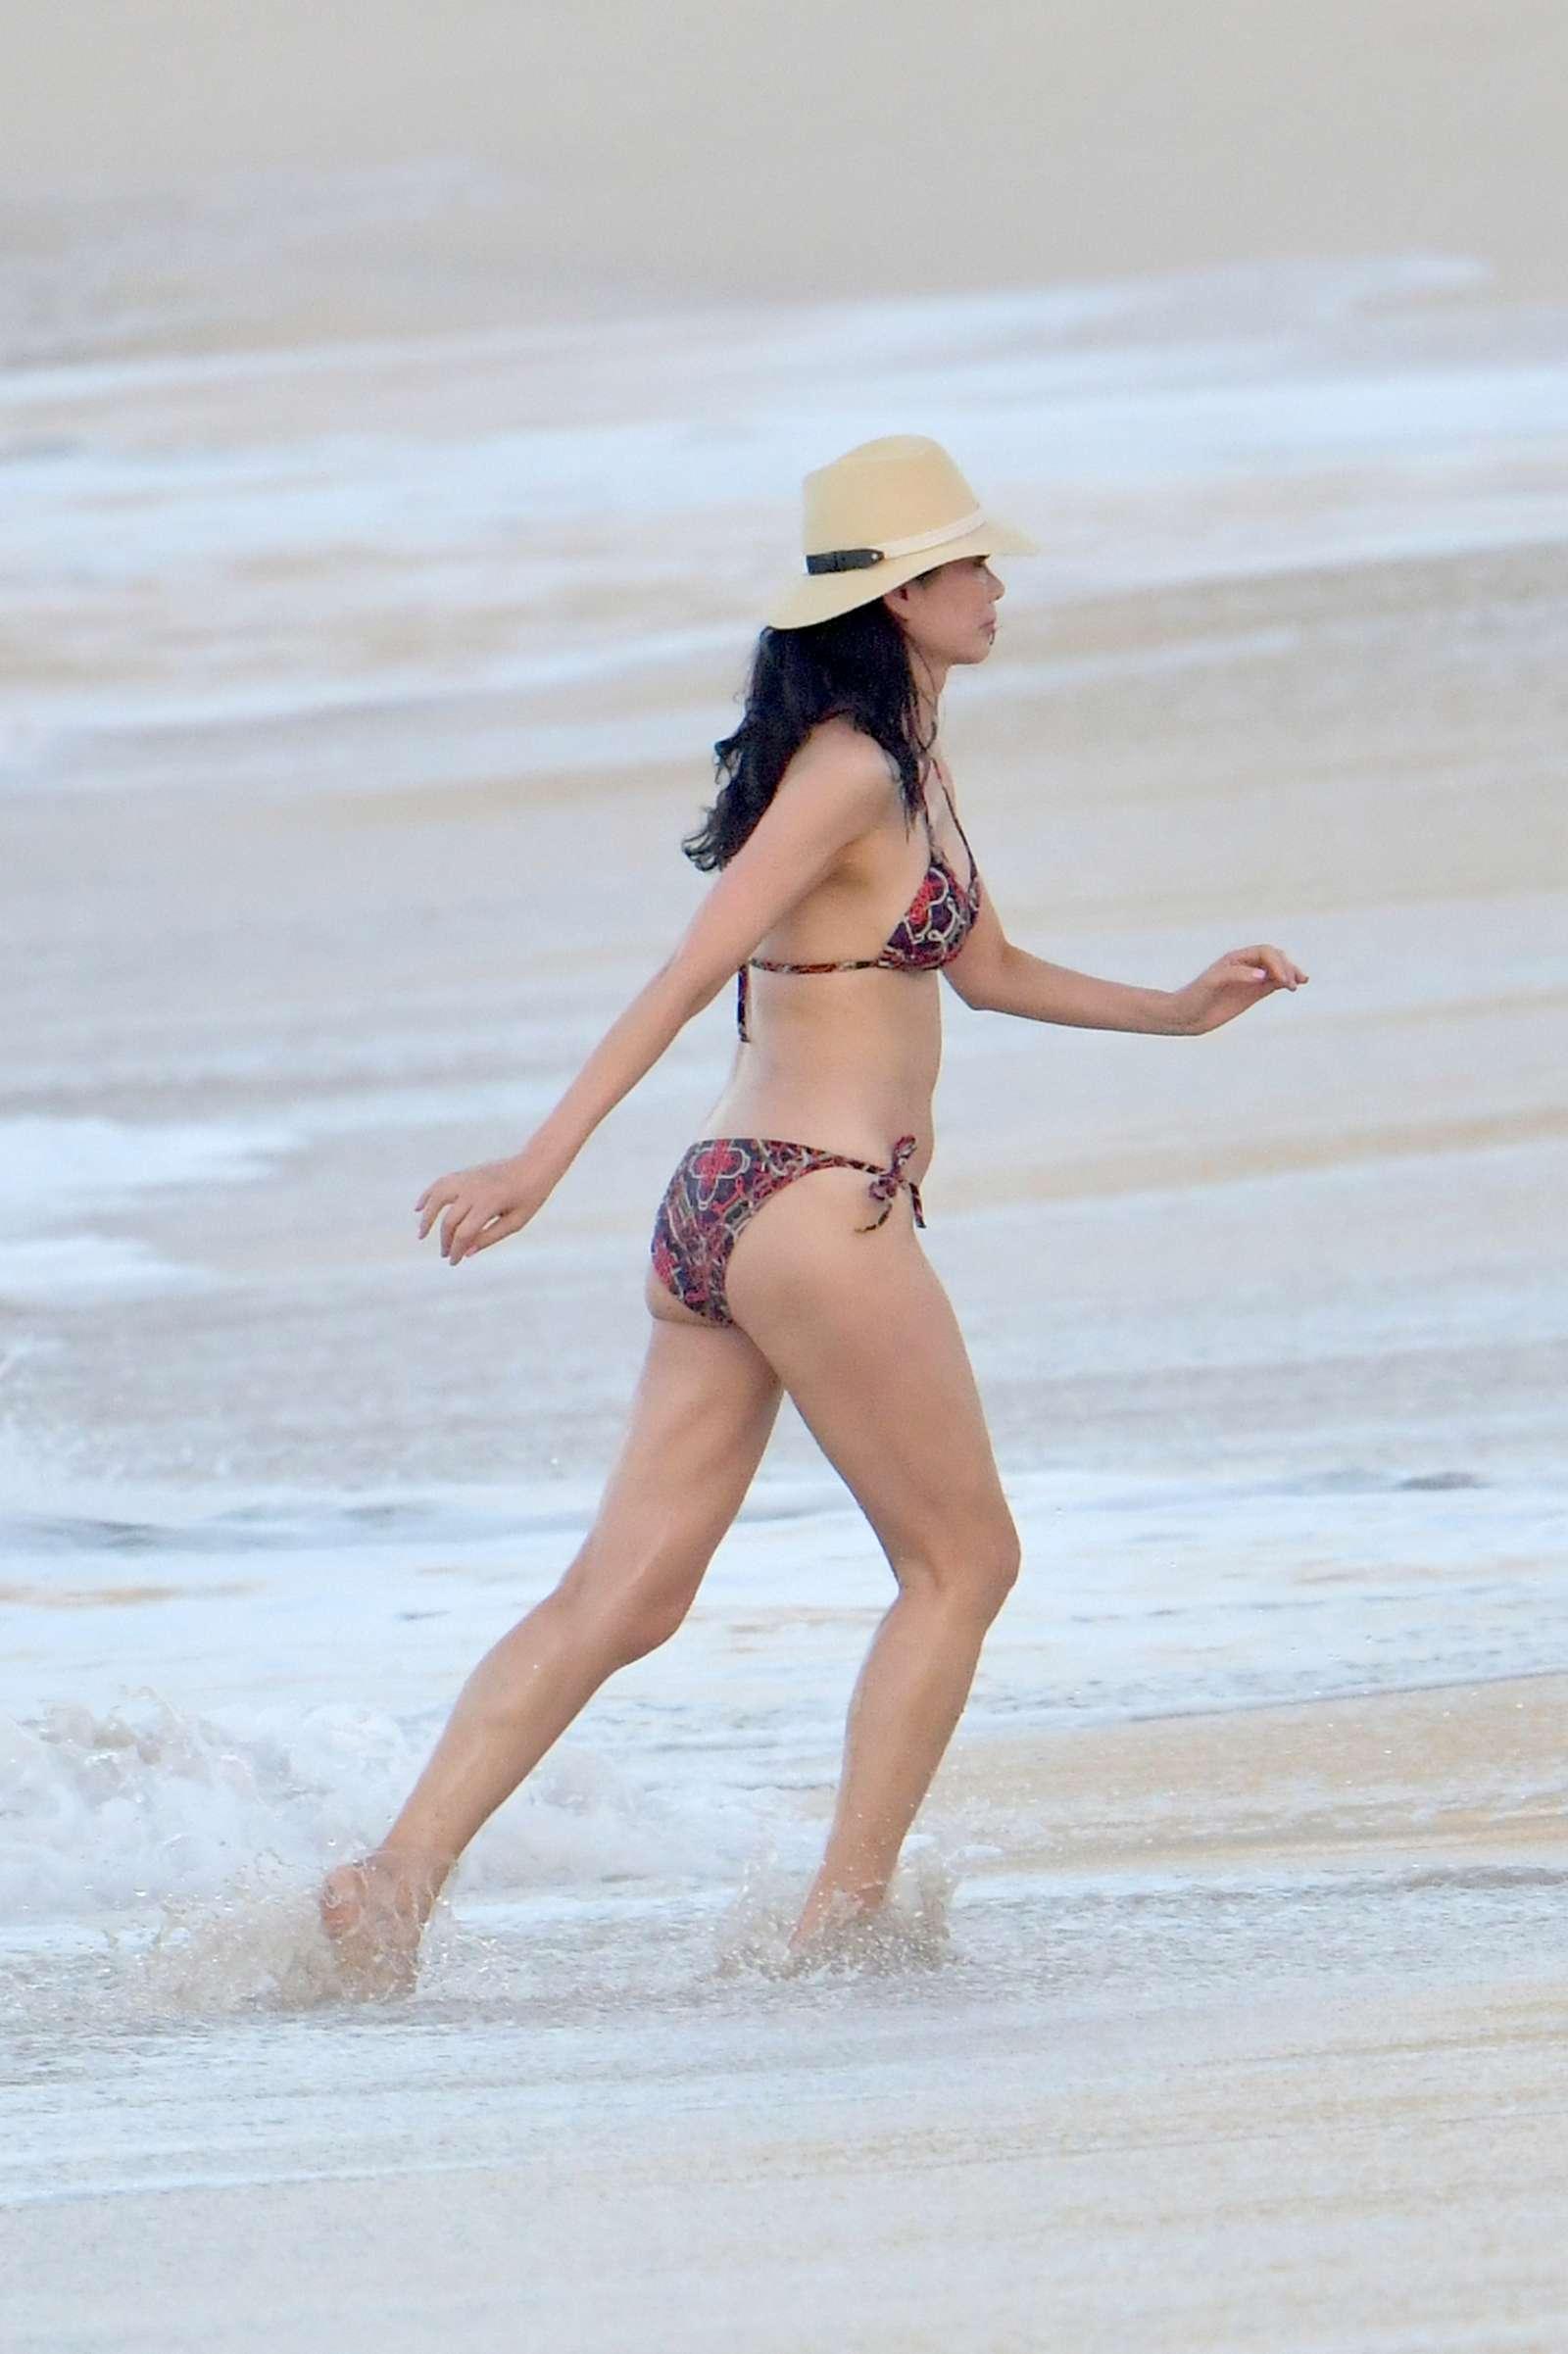 Wendi Deng Murdoch Bikini Nude Photos 32